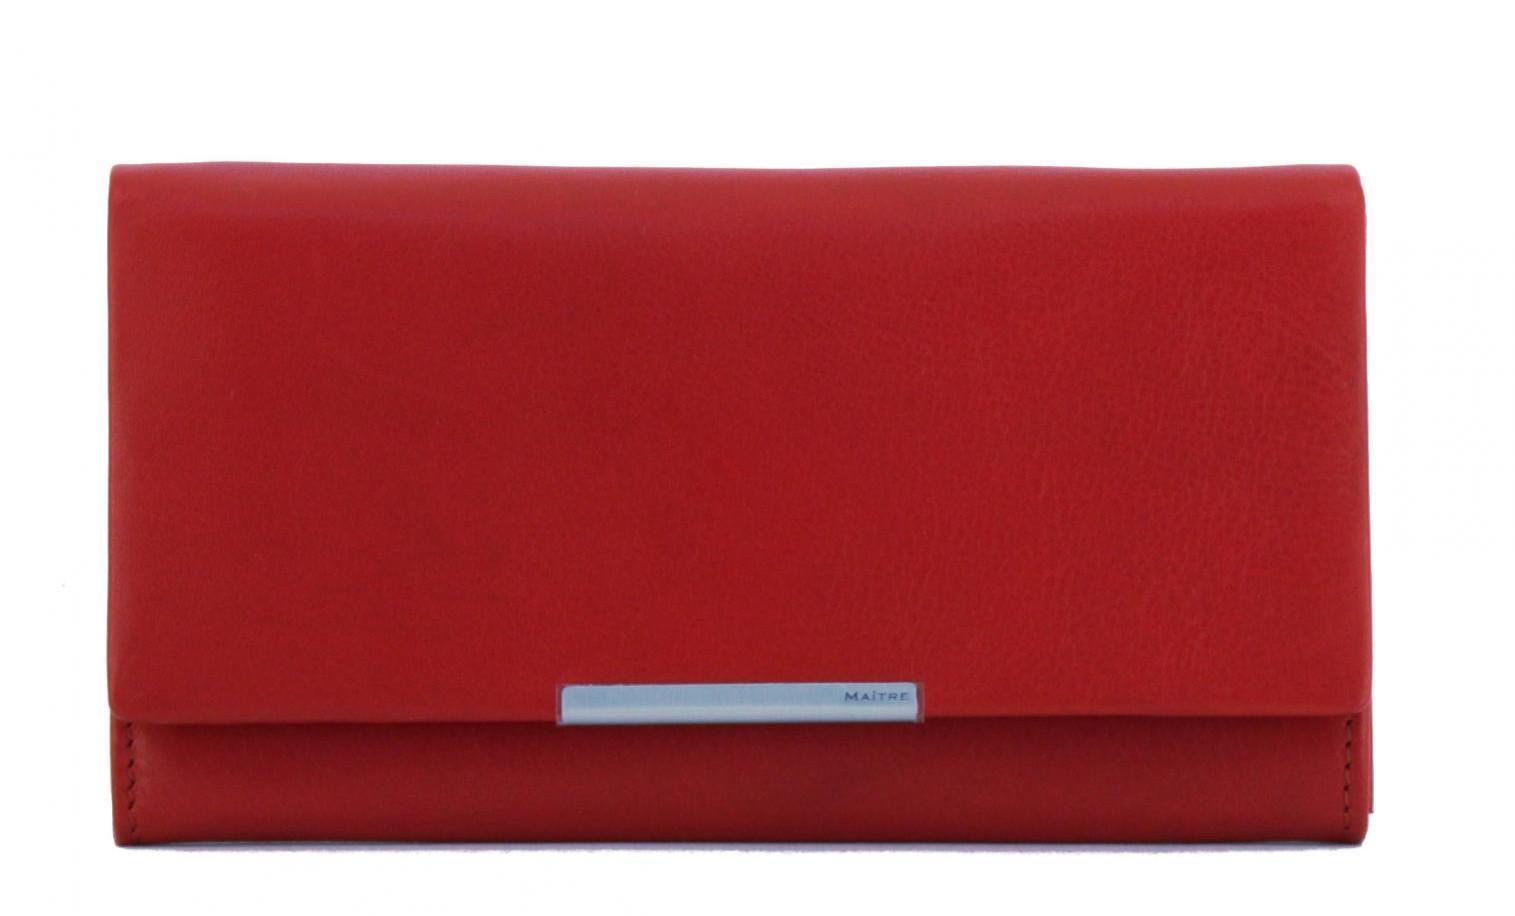 Maitre Damengeldbörse Belg Diedburg LH8F red rot